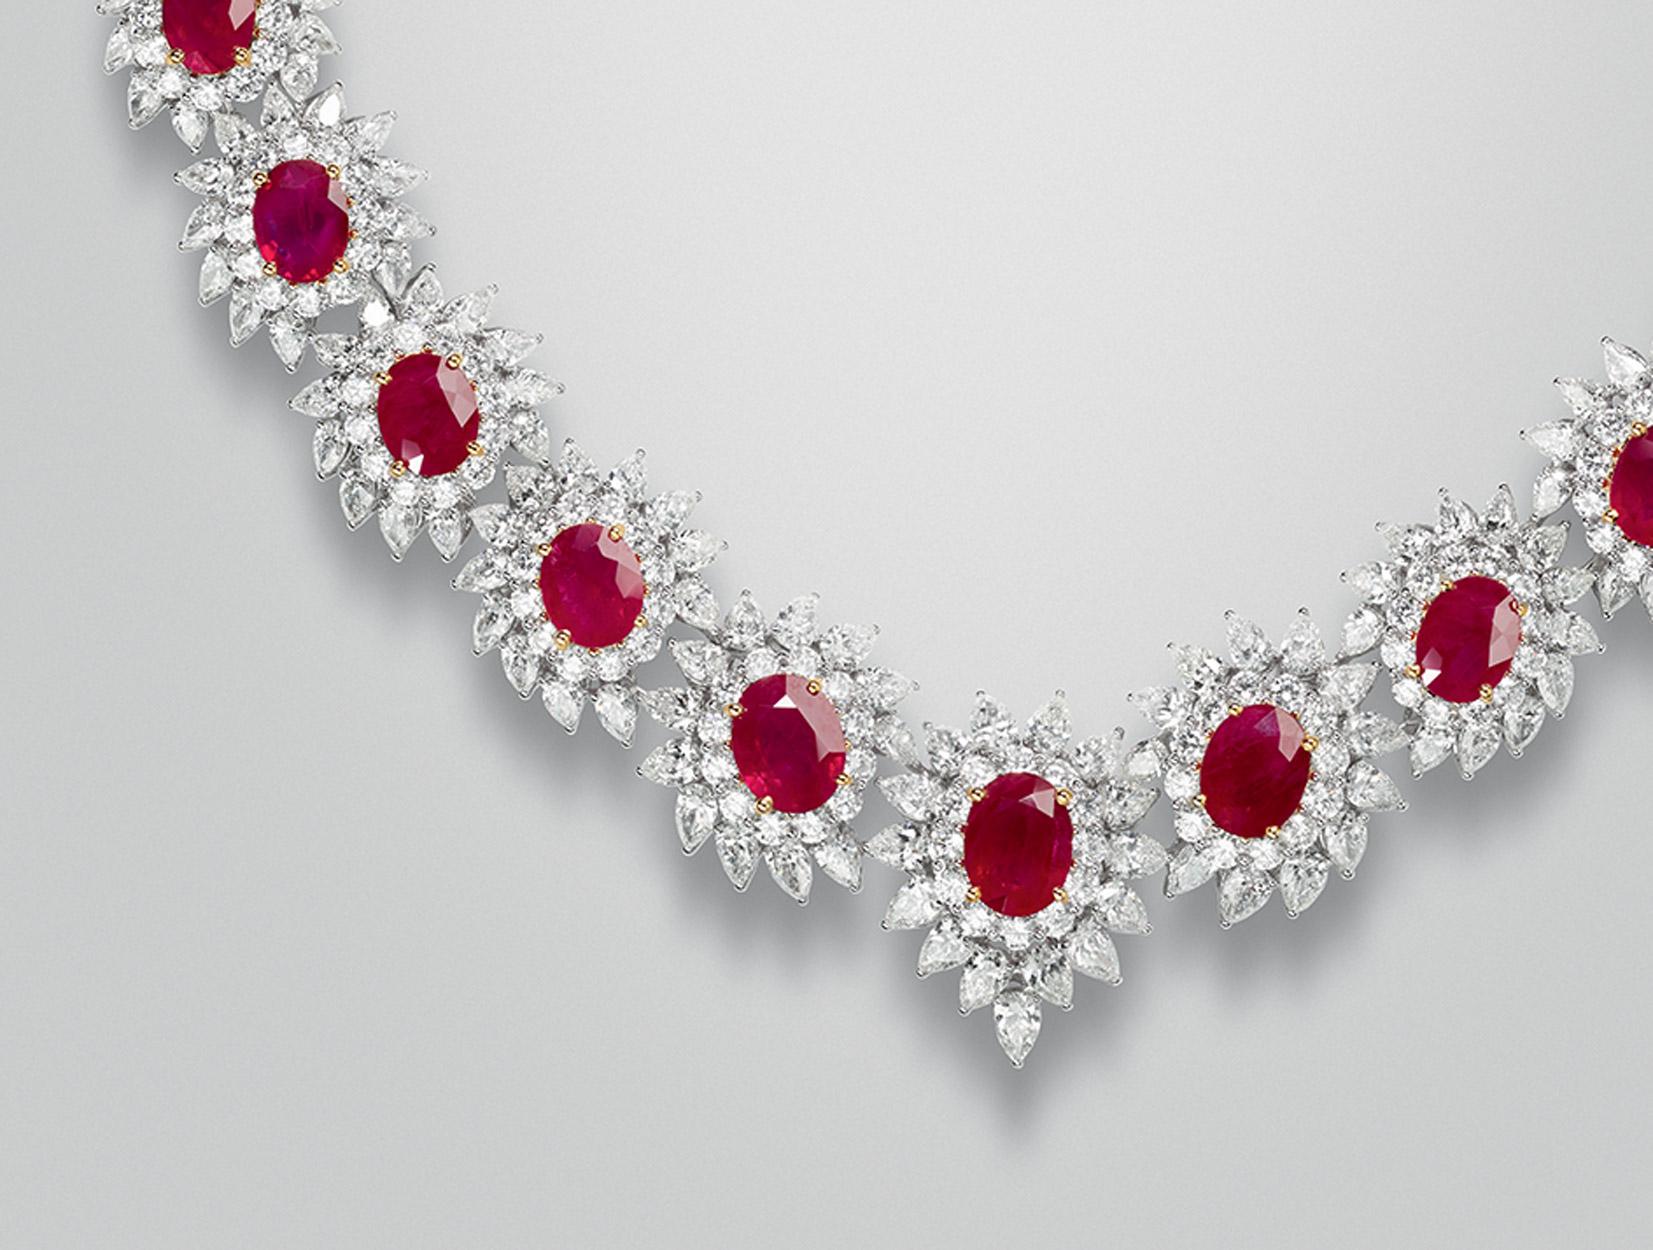 Rubies Necklace 02 | Maria Gaspari